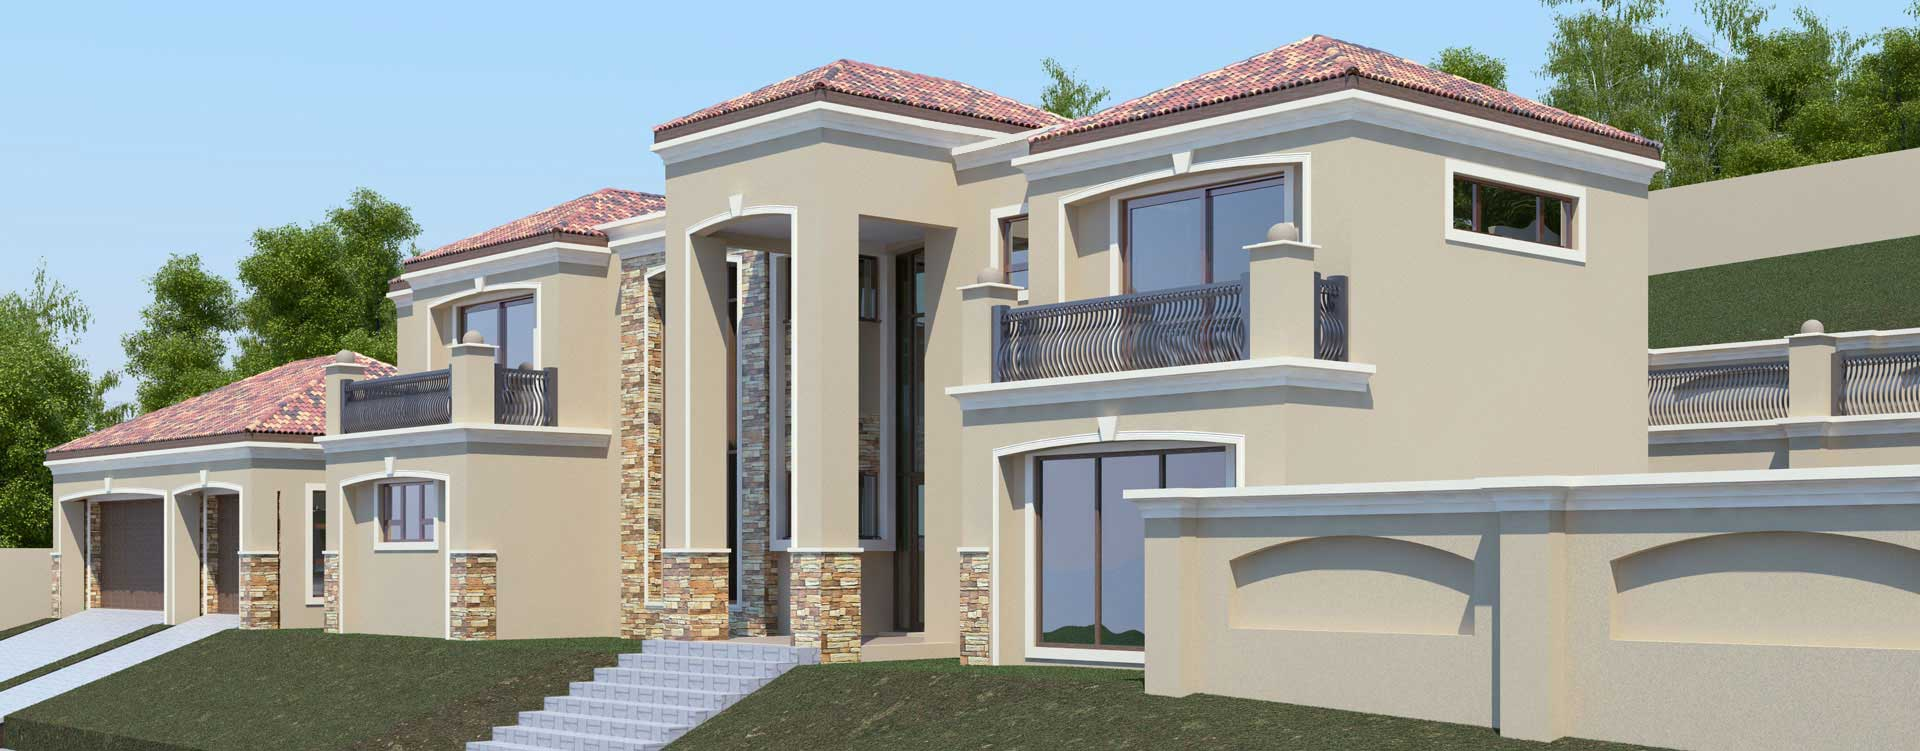 Double Storey House Plans Sa NethouseplansNethouseplans